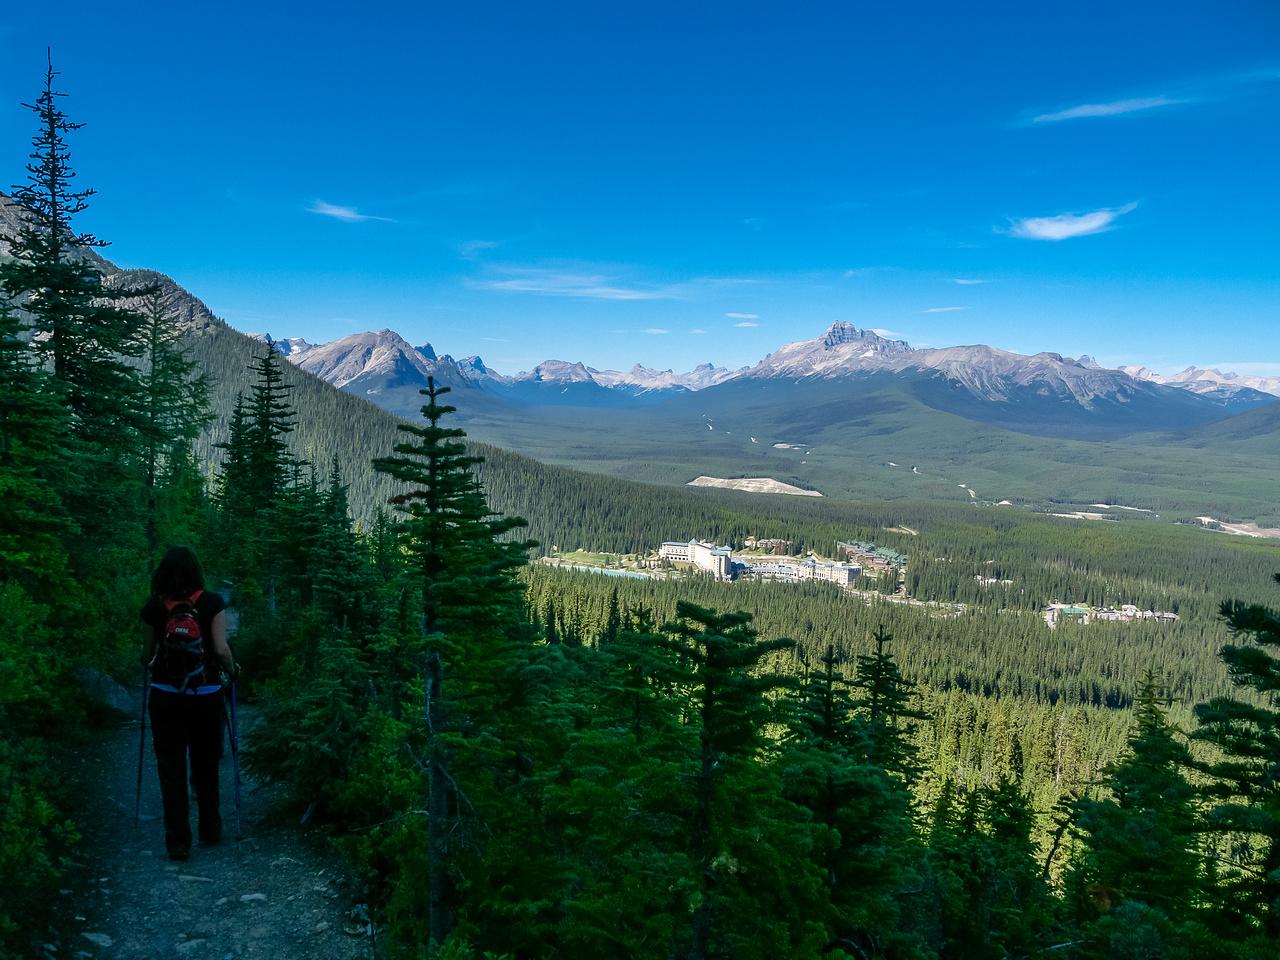 Descending back to Lake Louise from Saddleback Pass.